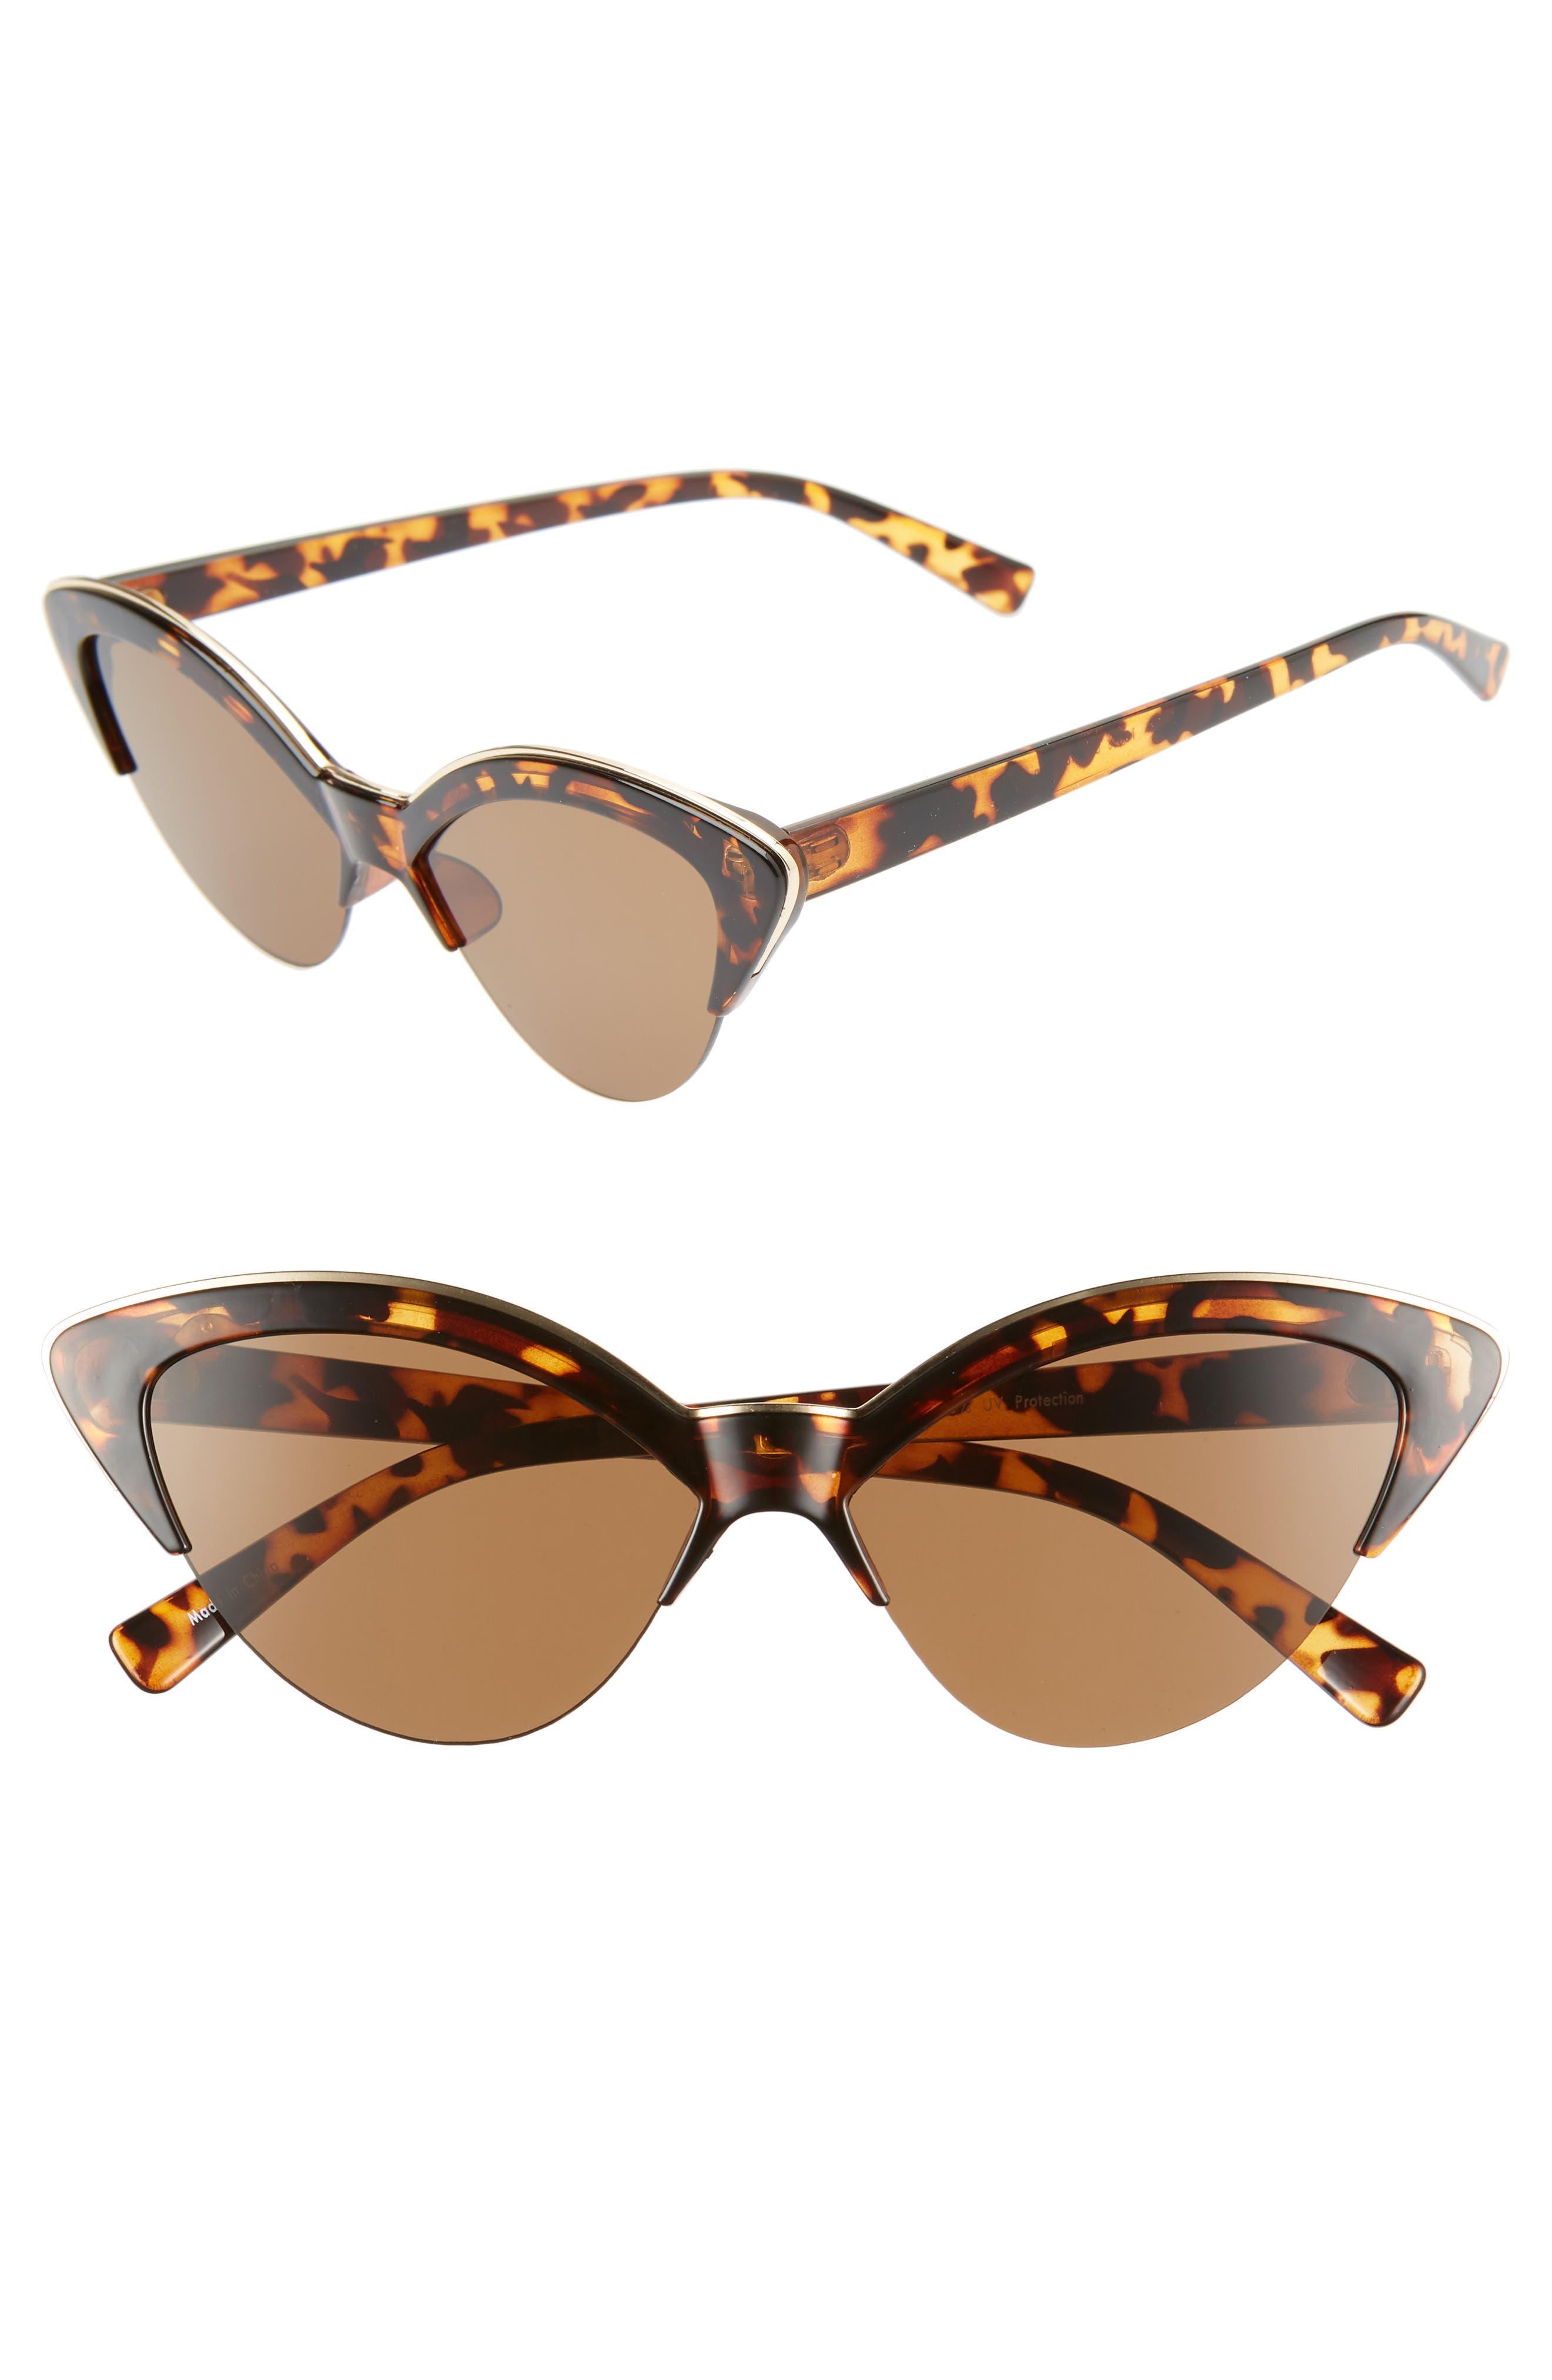 1d71fe1f18236 Leith 5m Metal Trim Cat Eye Sunglasses -